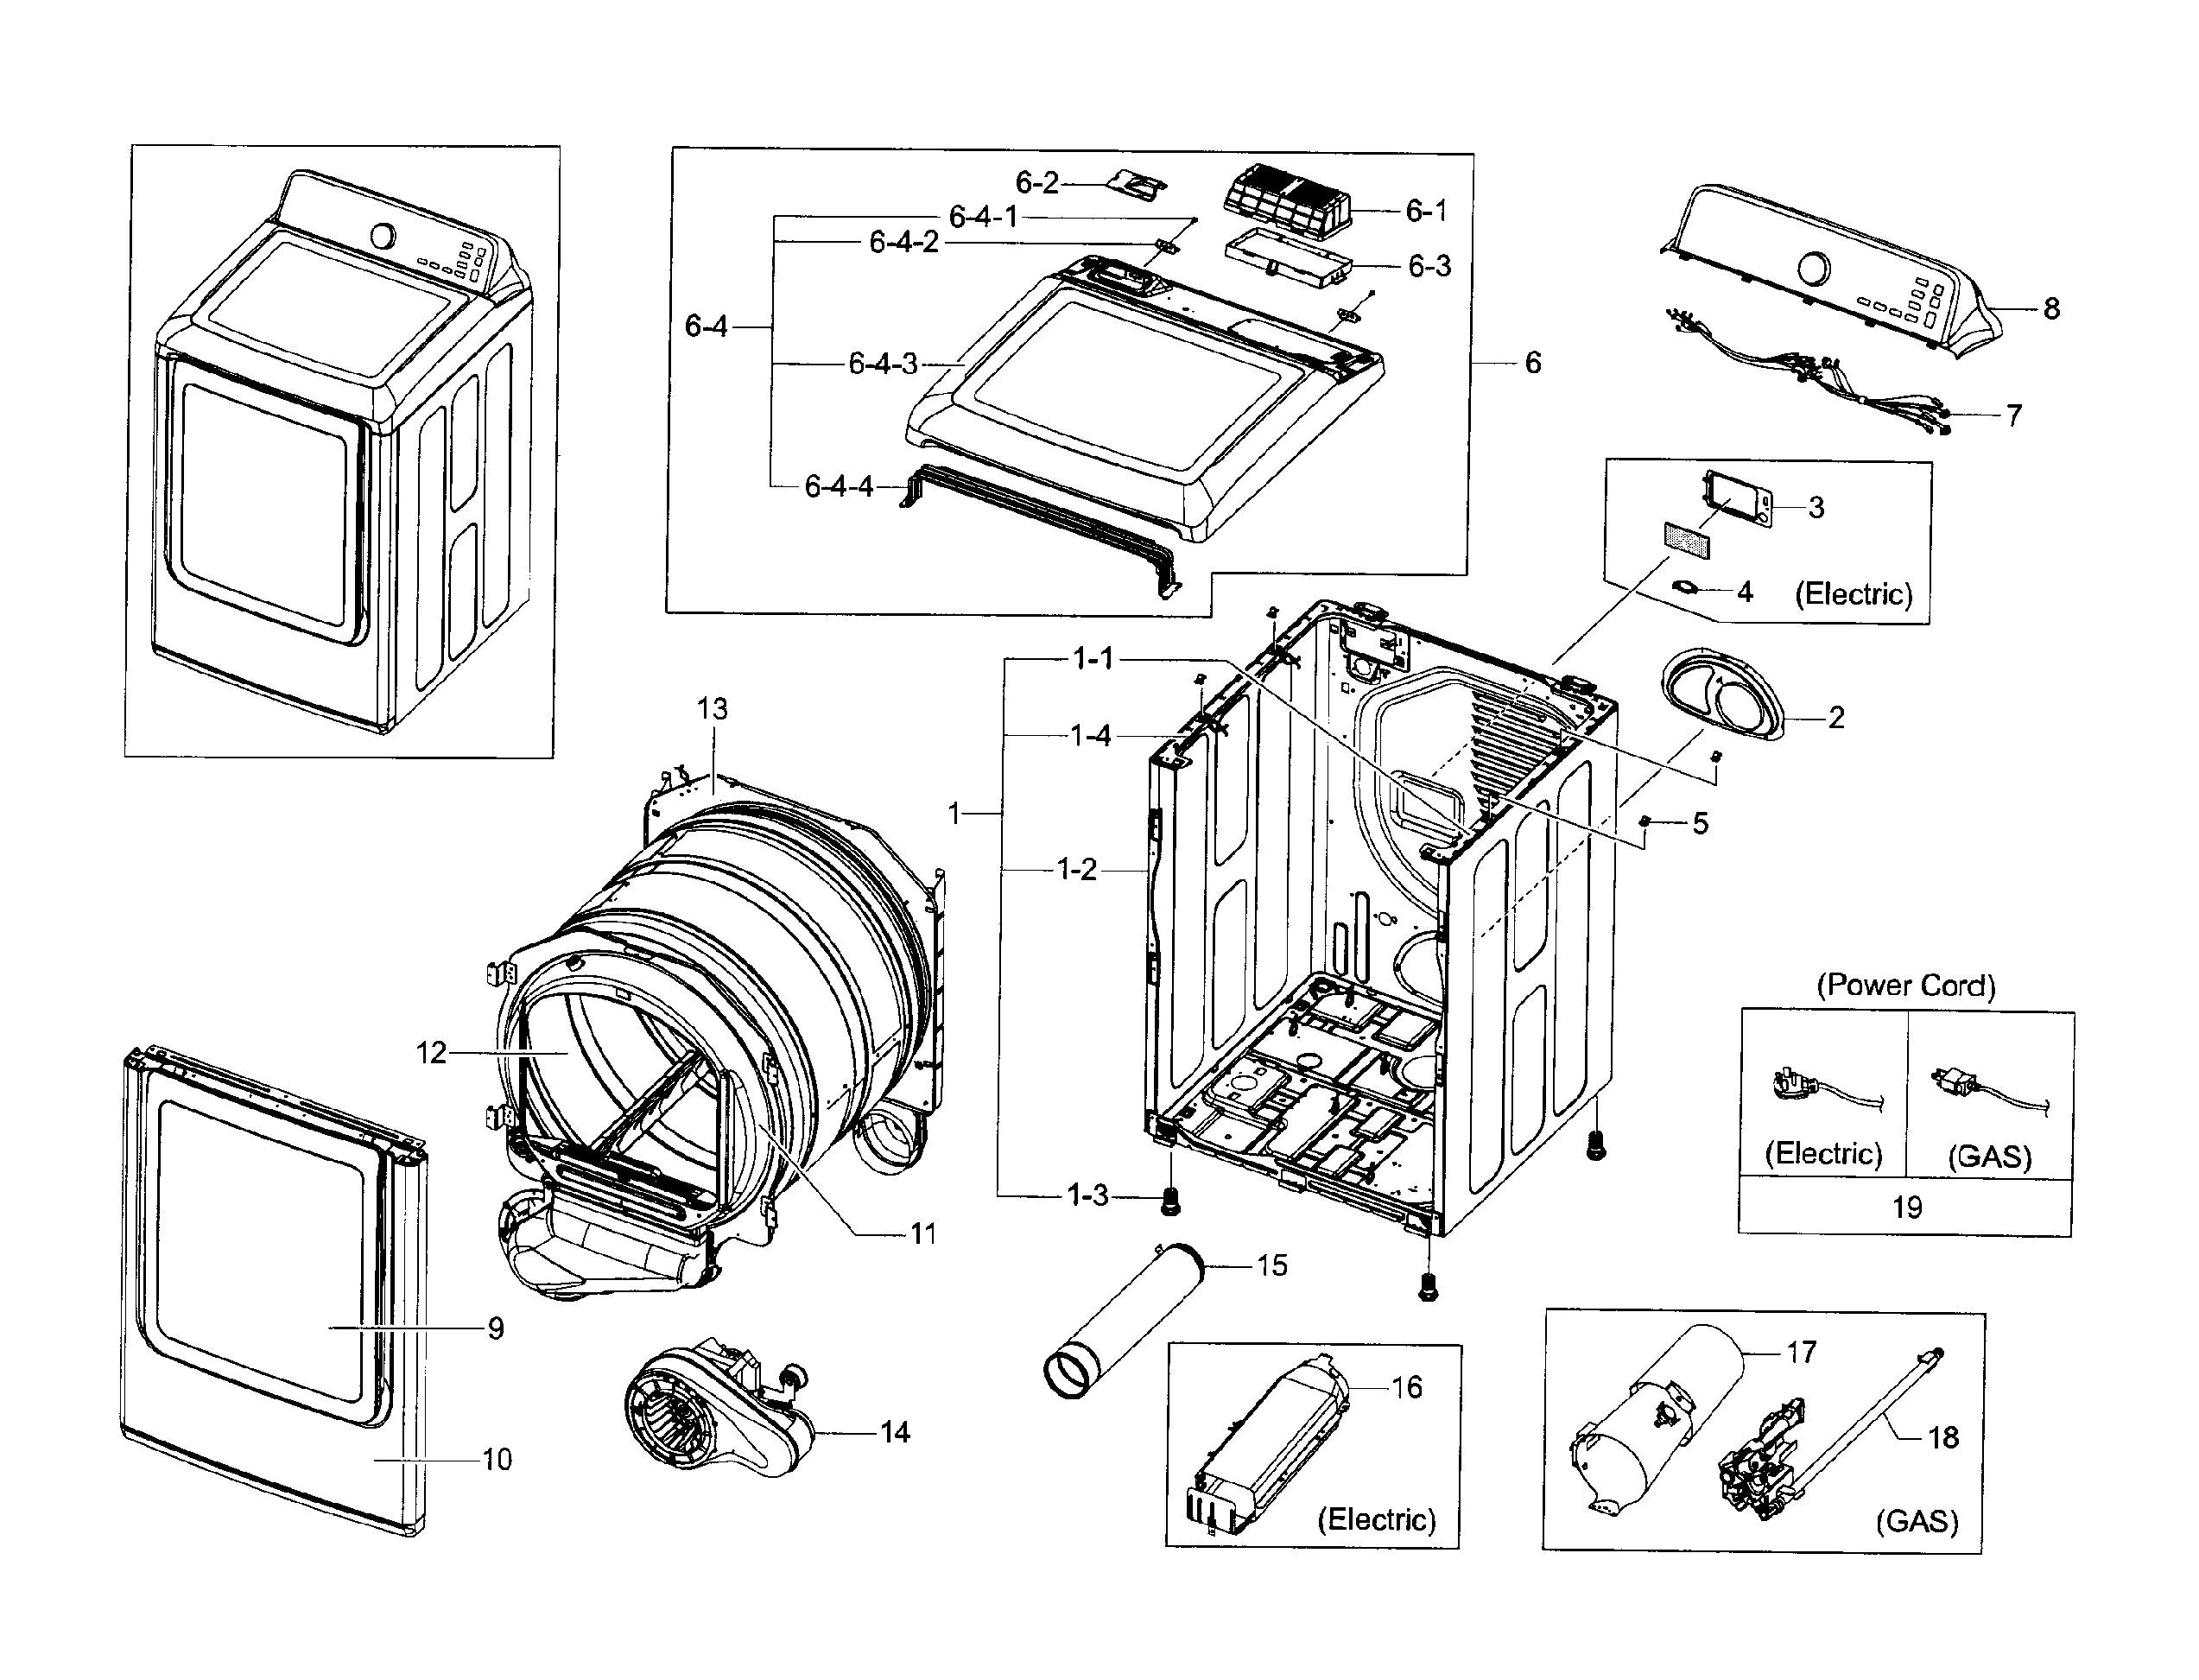 Samsung Dryer Dve G 50r5400 Wiring Diagrams Find Out Here Wiring Diagram for Samsung Dryer Heating Element Sample Of Samsung Dryer Dve G 50r5400 Wiring Diagrams